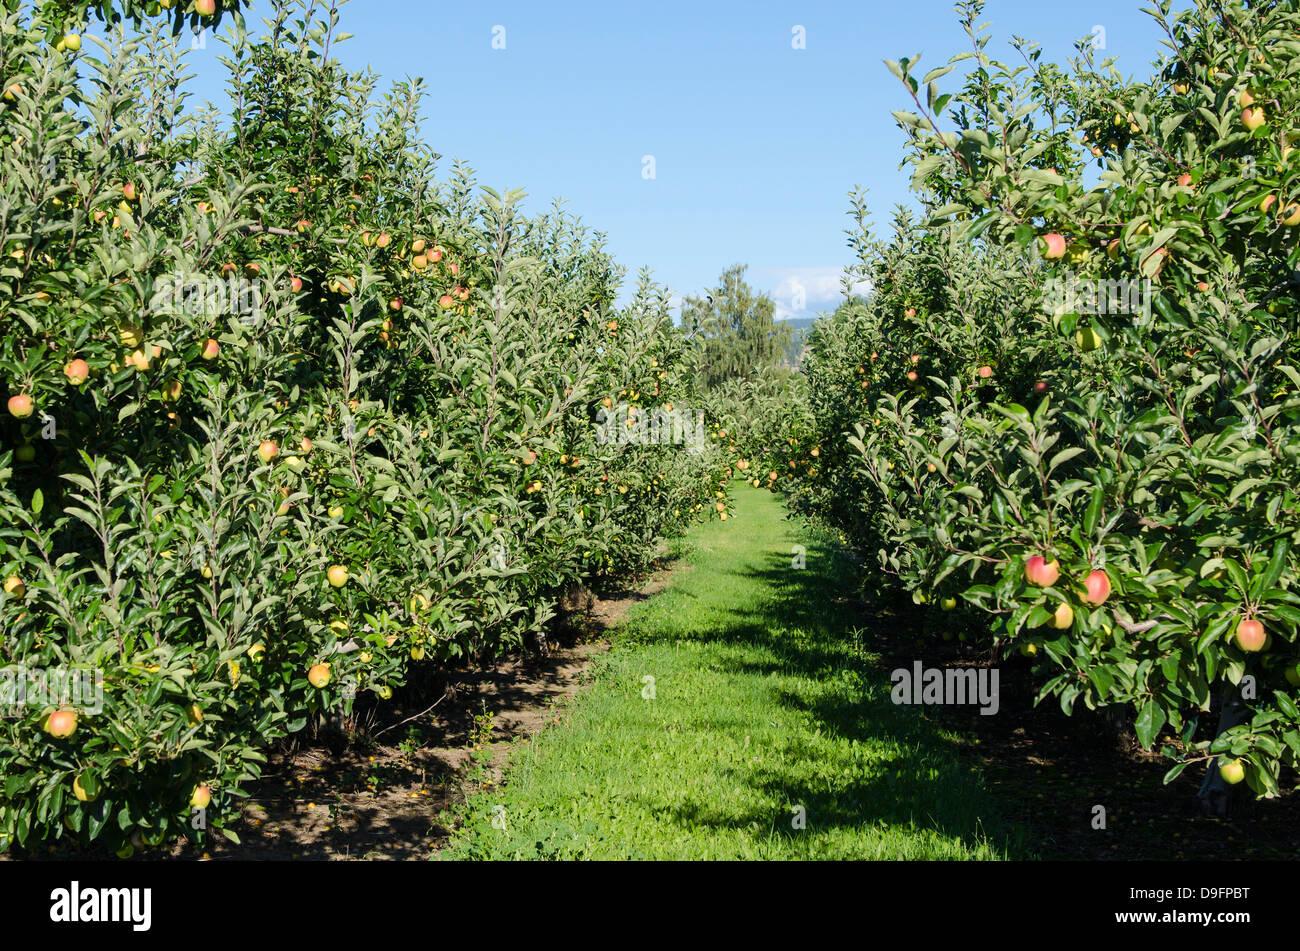 Apple orchard, Kelowna, British Columbia, Canada - Stock Image